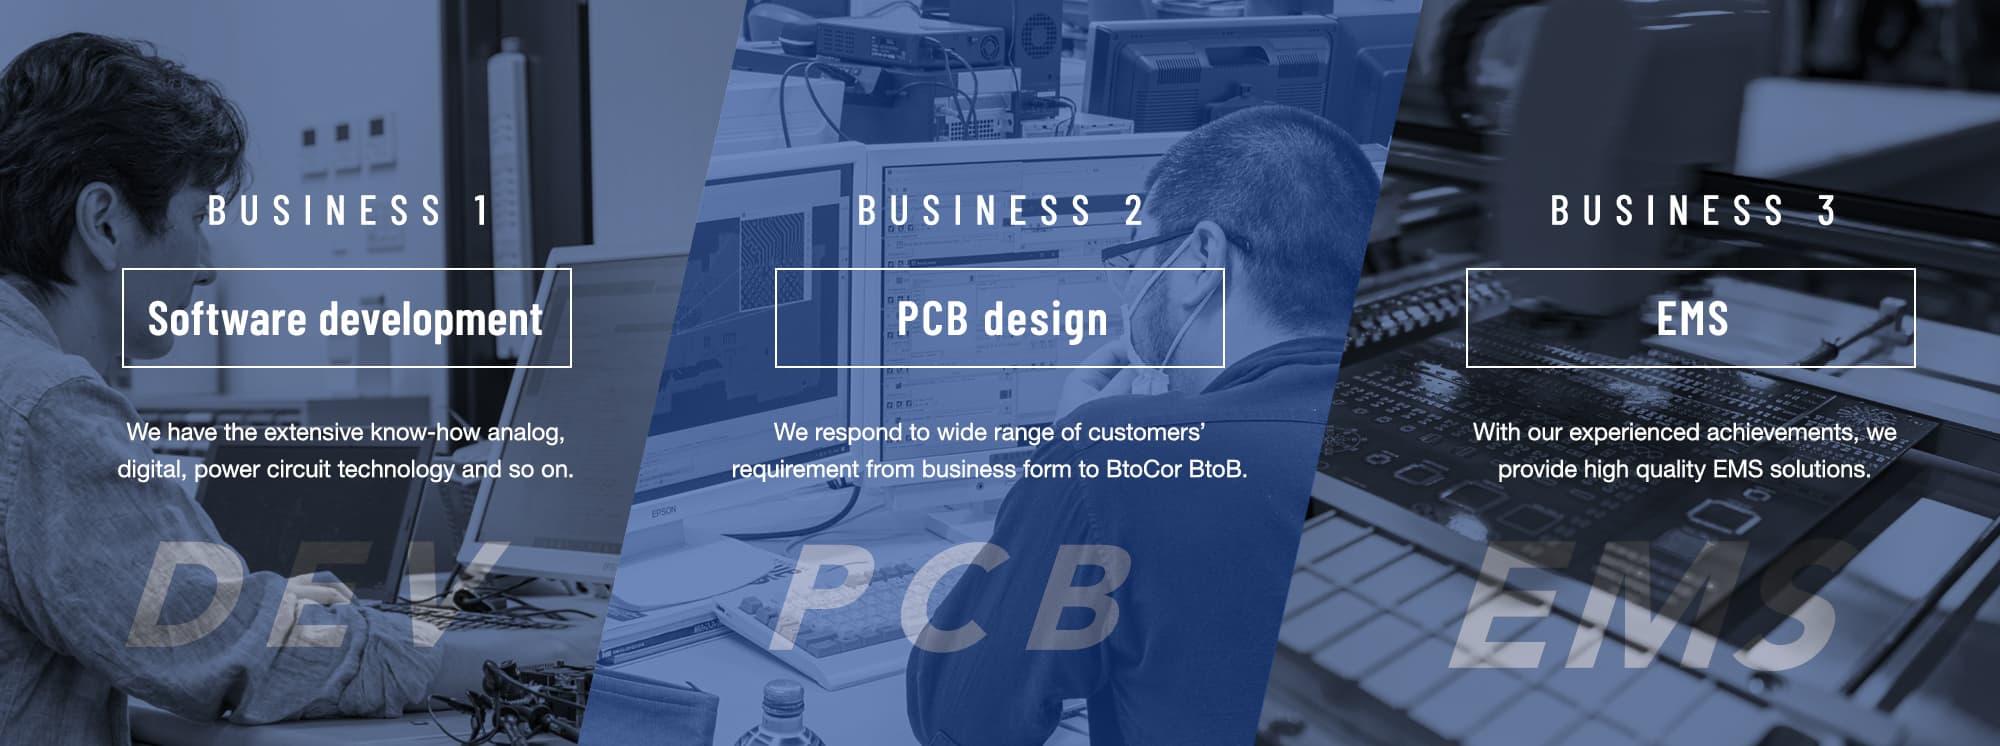 Software development,PCB design,EMS